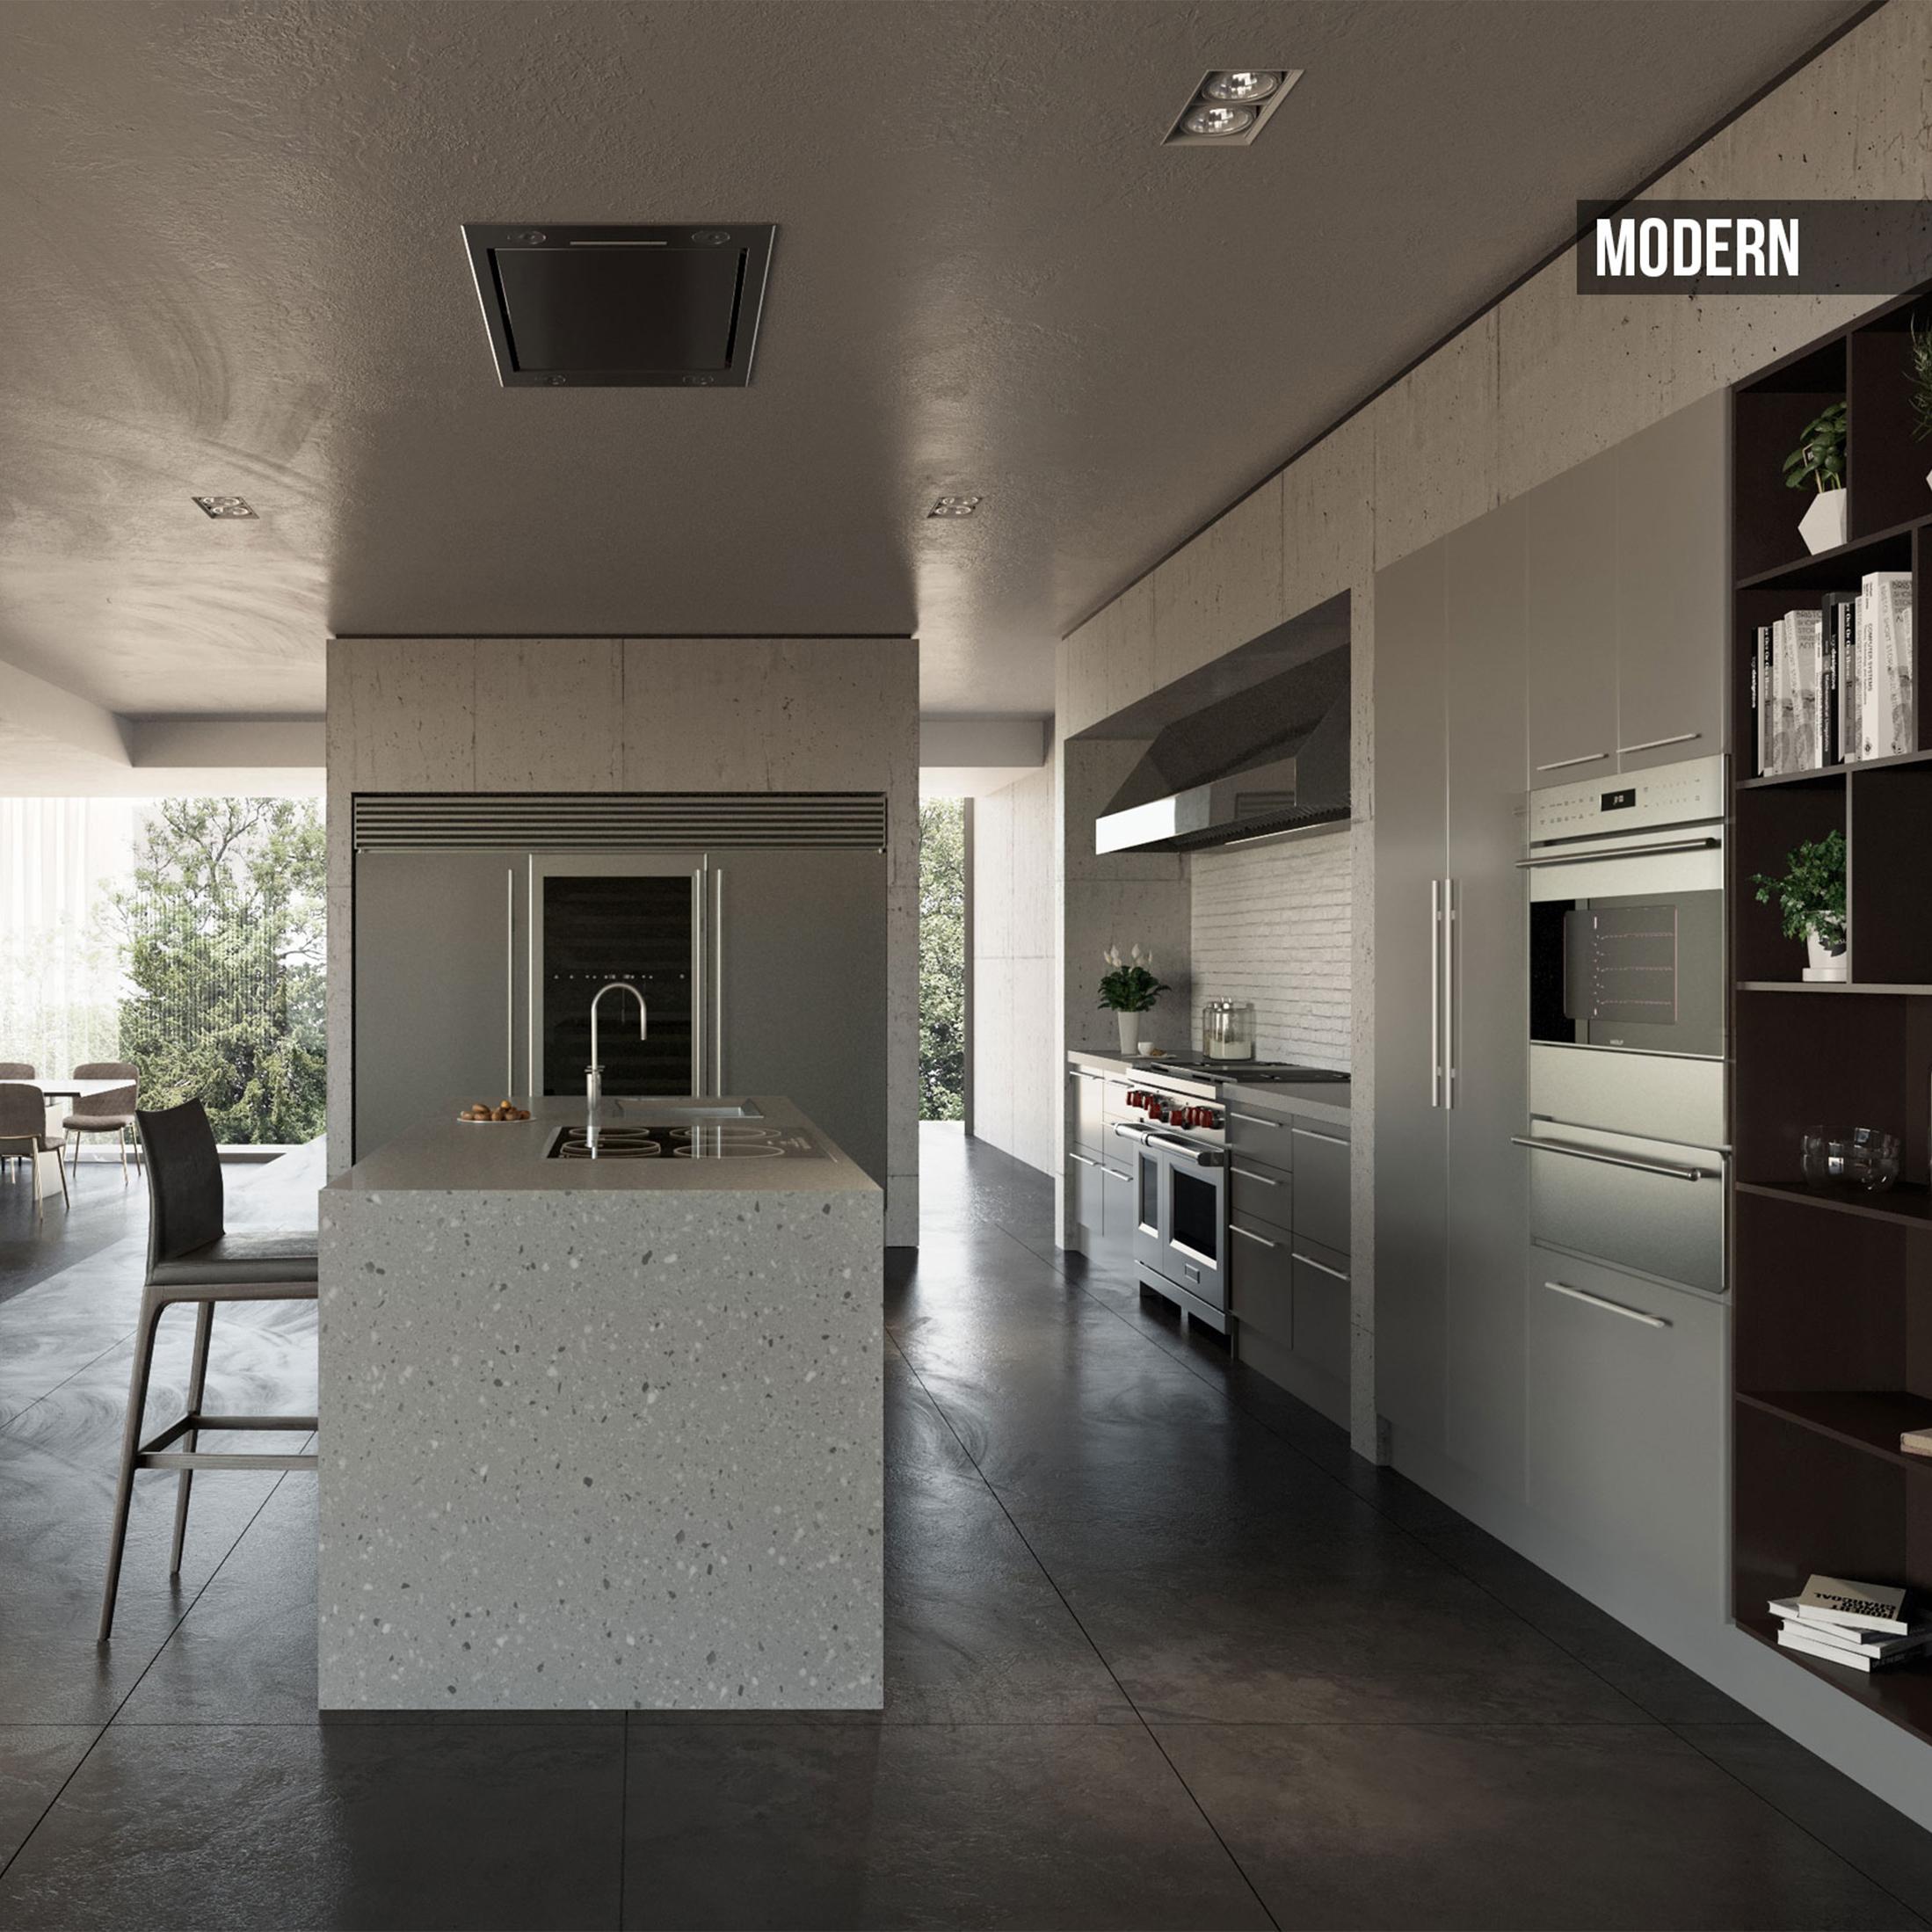 Kafco Aluminum Kitchen - Modern